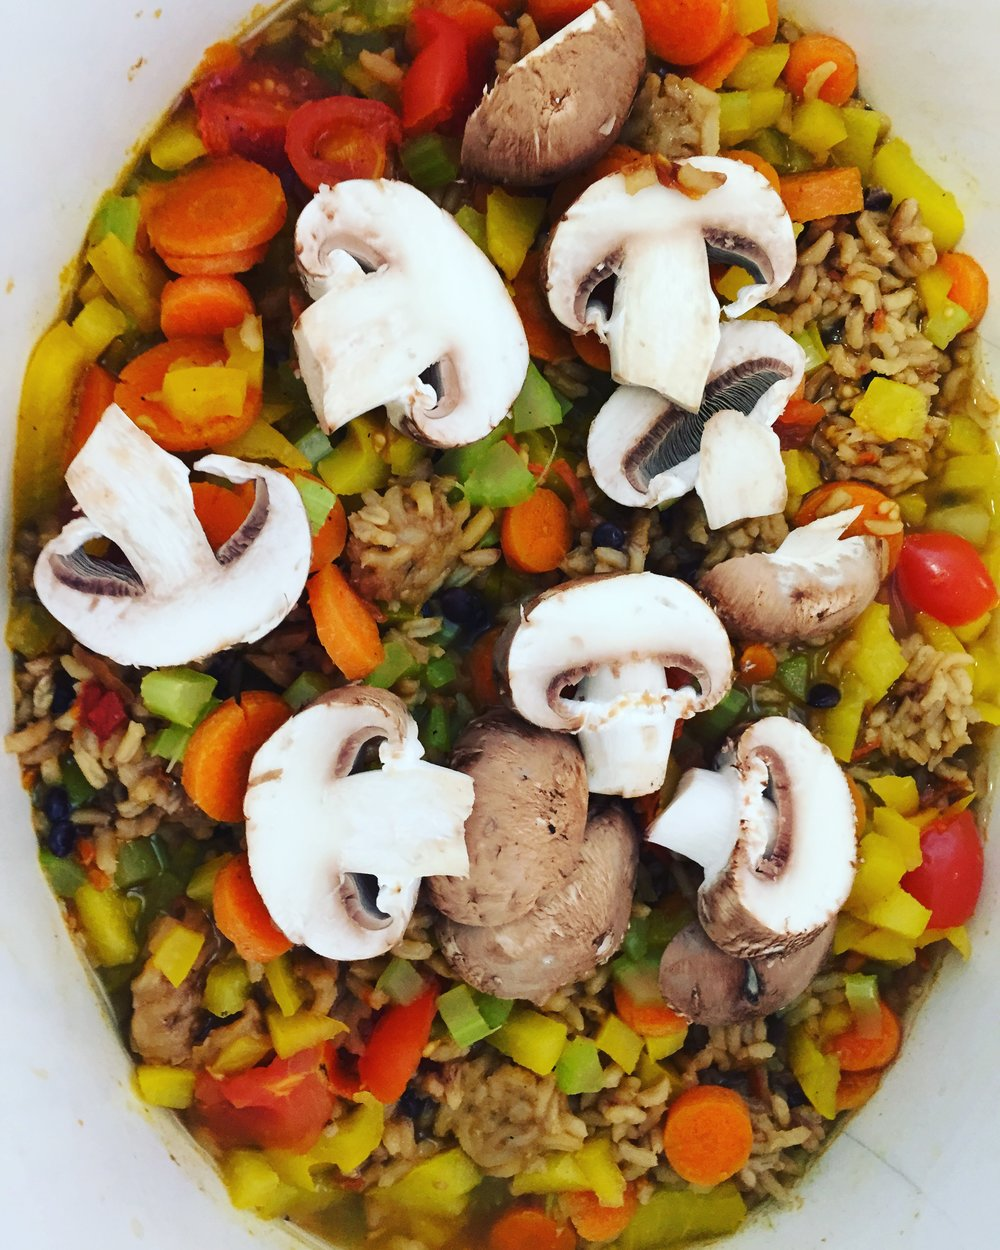 mushroom-mix.JPG